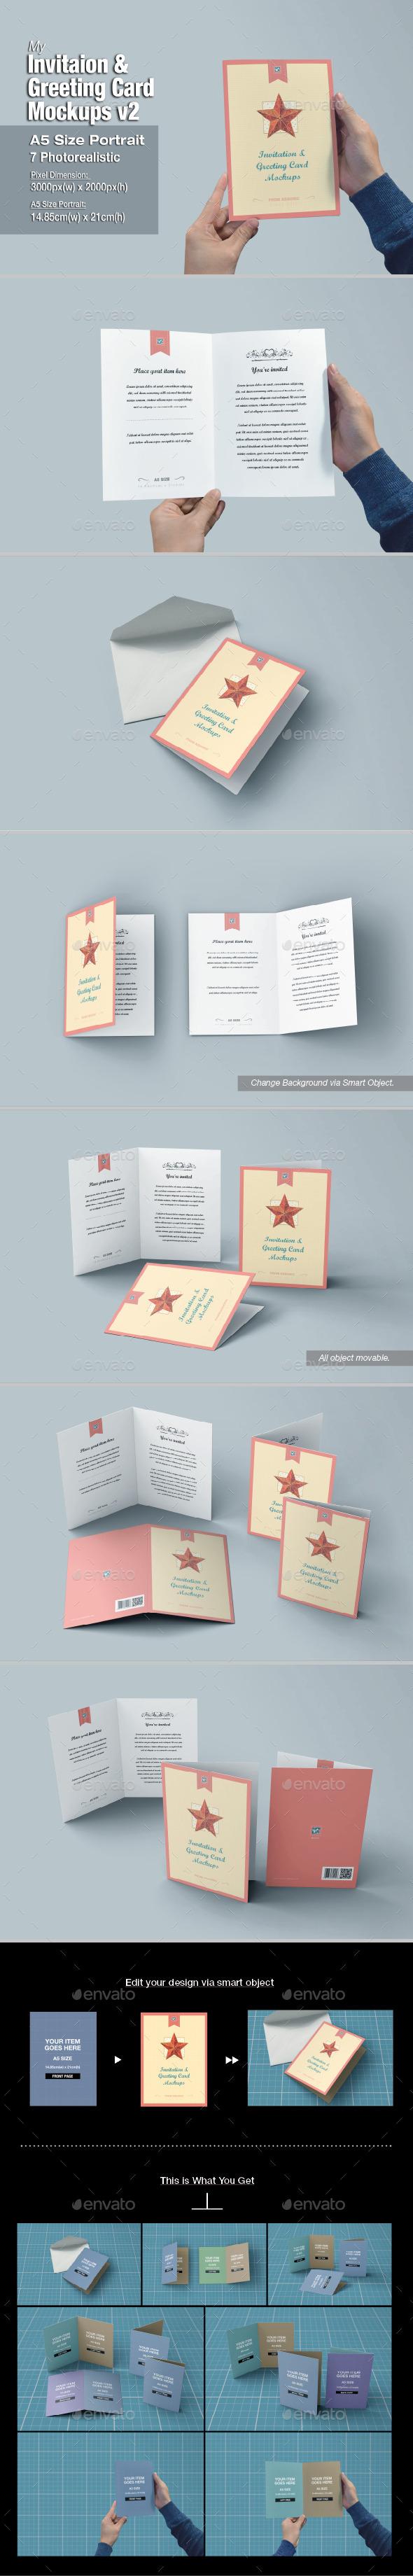 GraphicRiver myGreeting Card Mock-up v2 10988459